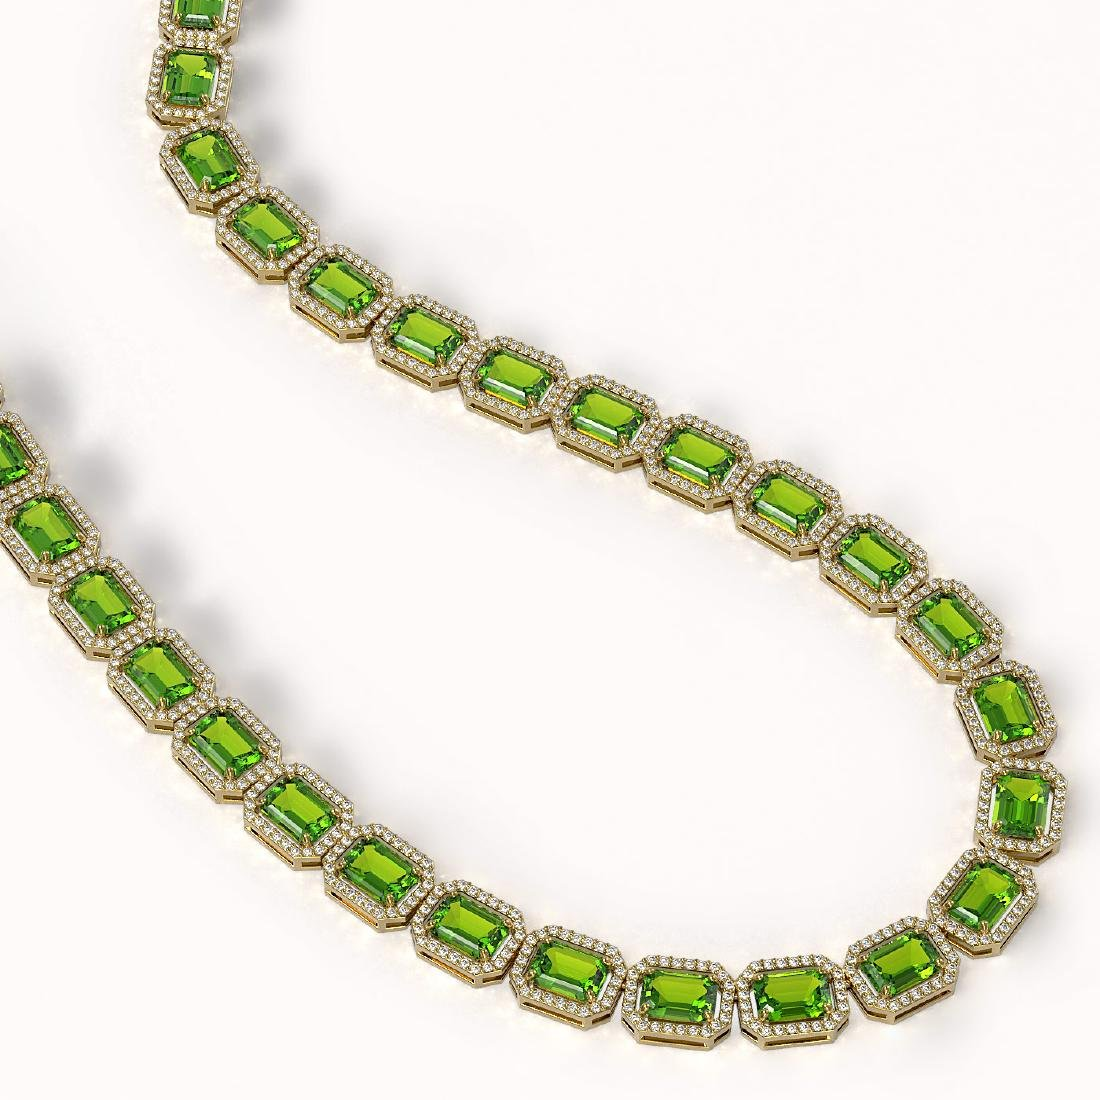 57.3 CTW Peridot & Diamond Halo Necklace 10K Yellow - 2